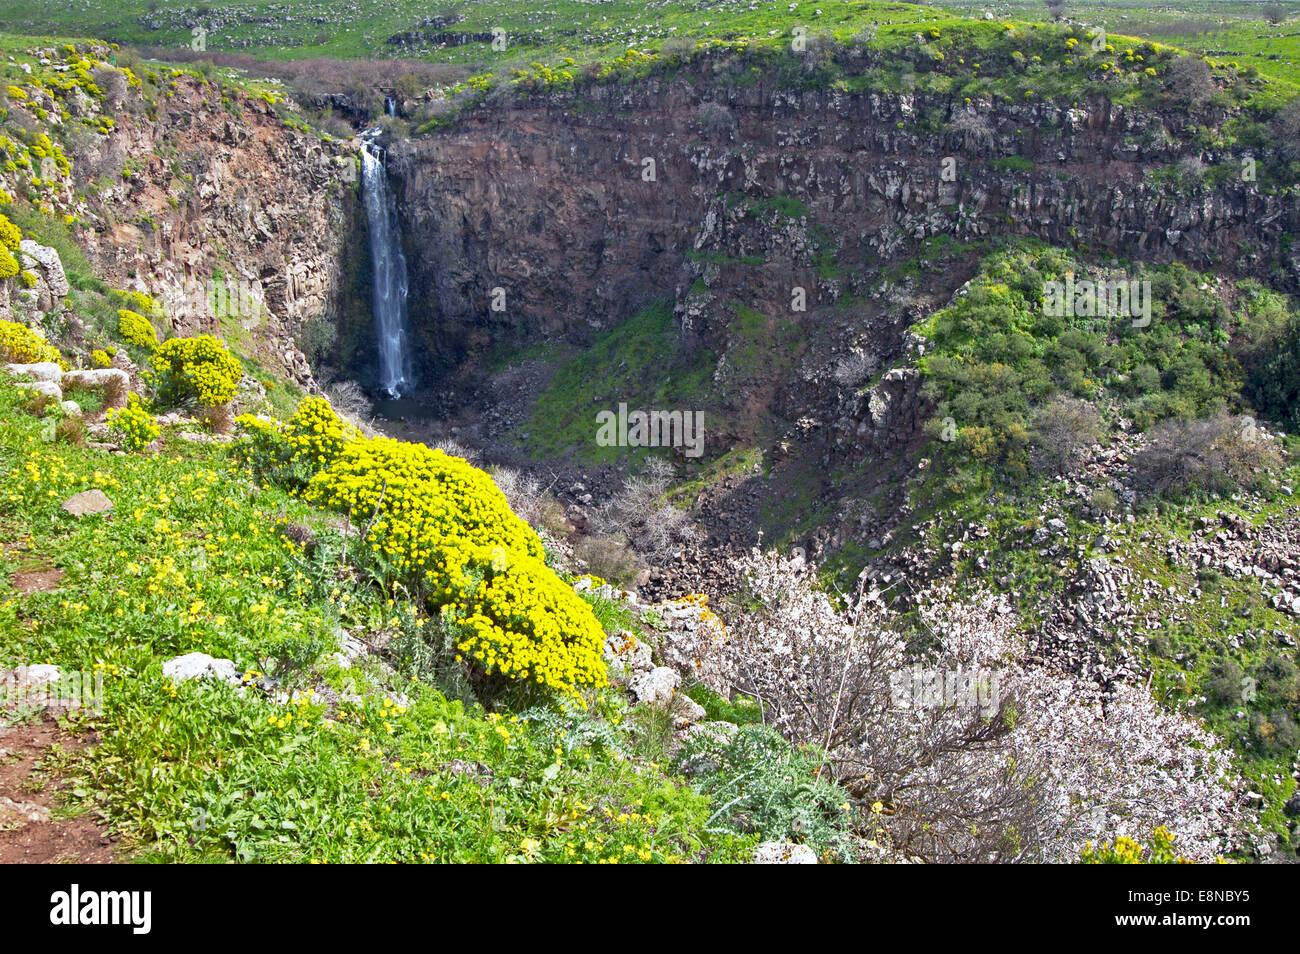 Gamla falls, Golan heights, Israel - Stock Image